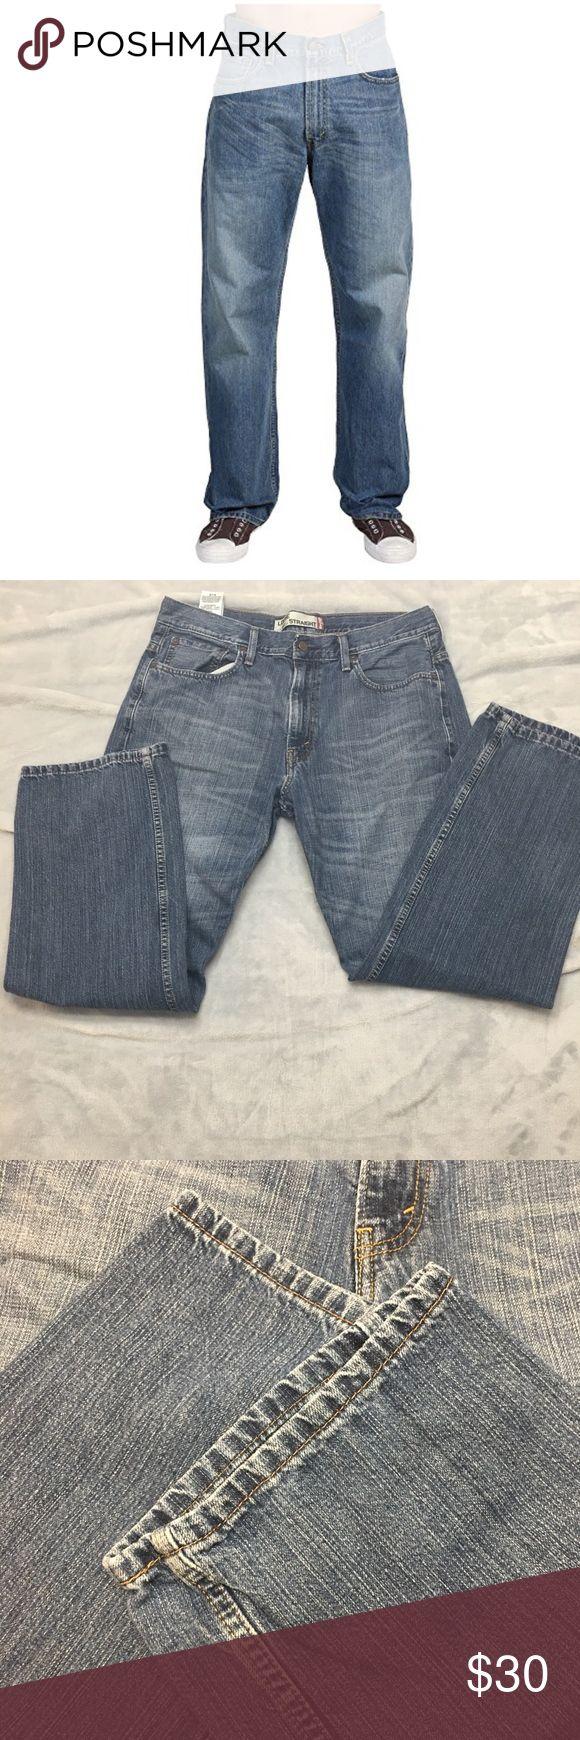 Levi 569 loose men's jeans Good condition. Levi's Jeans Straight